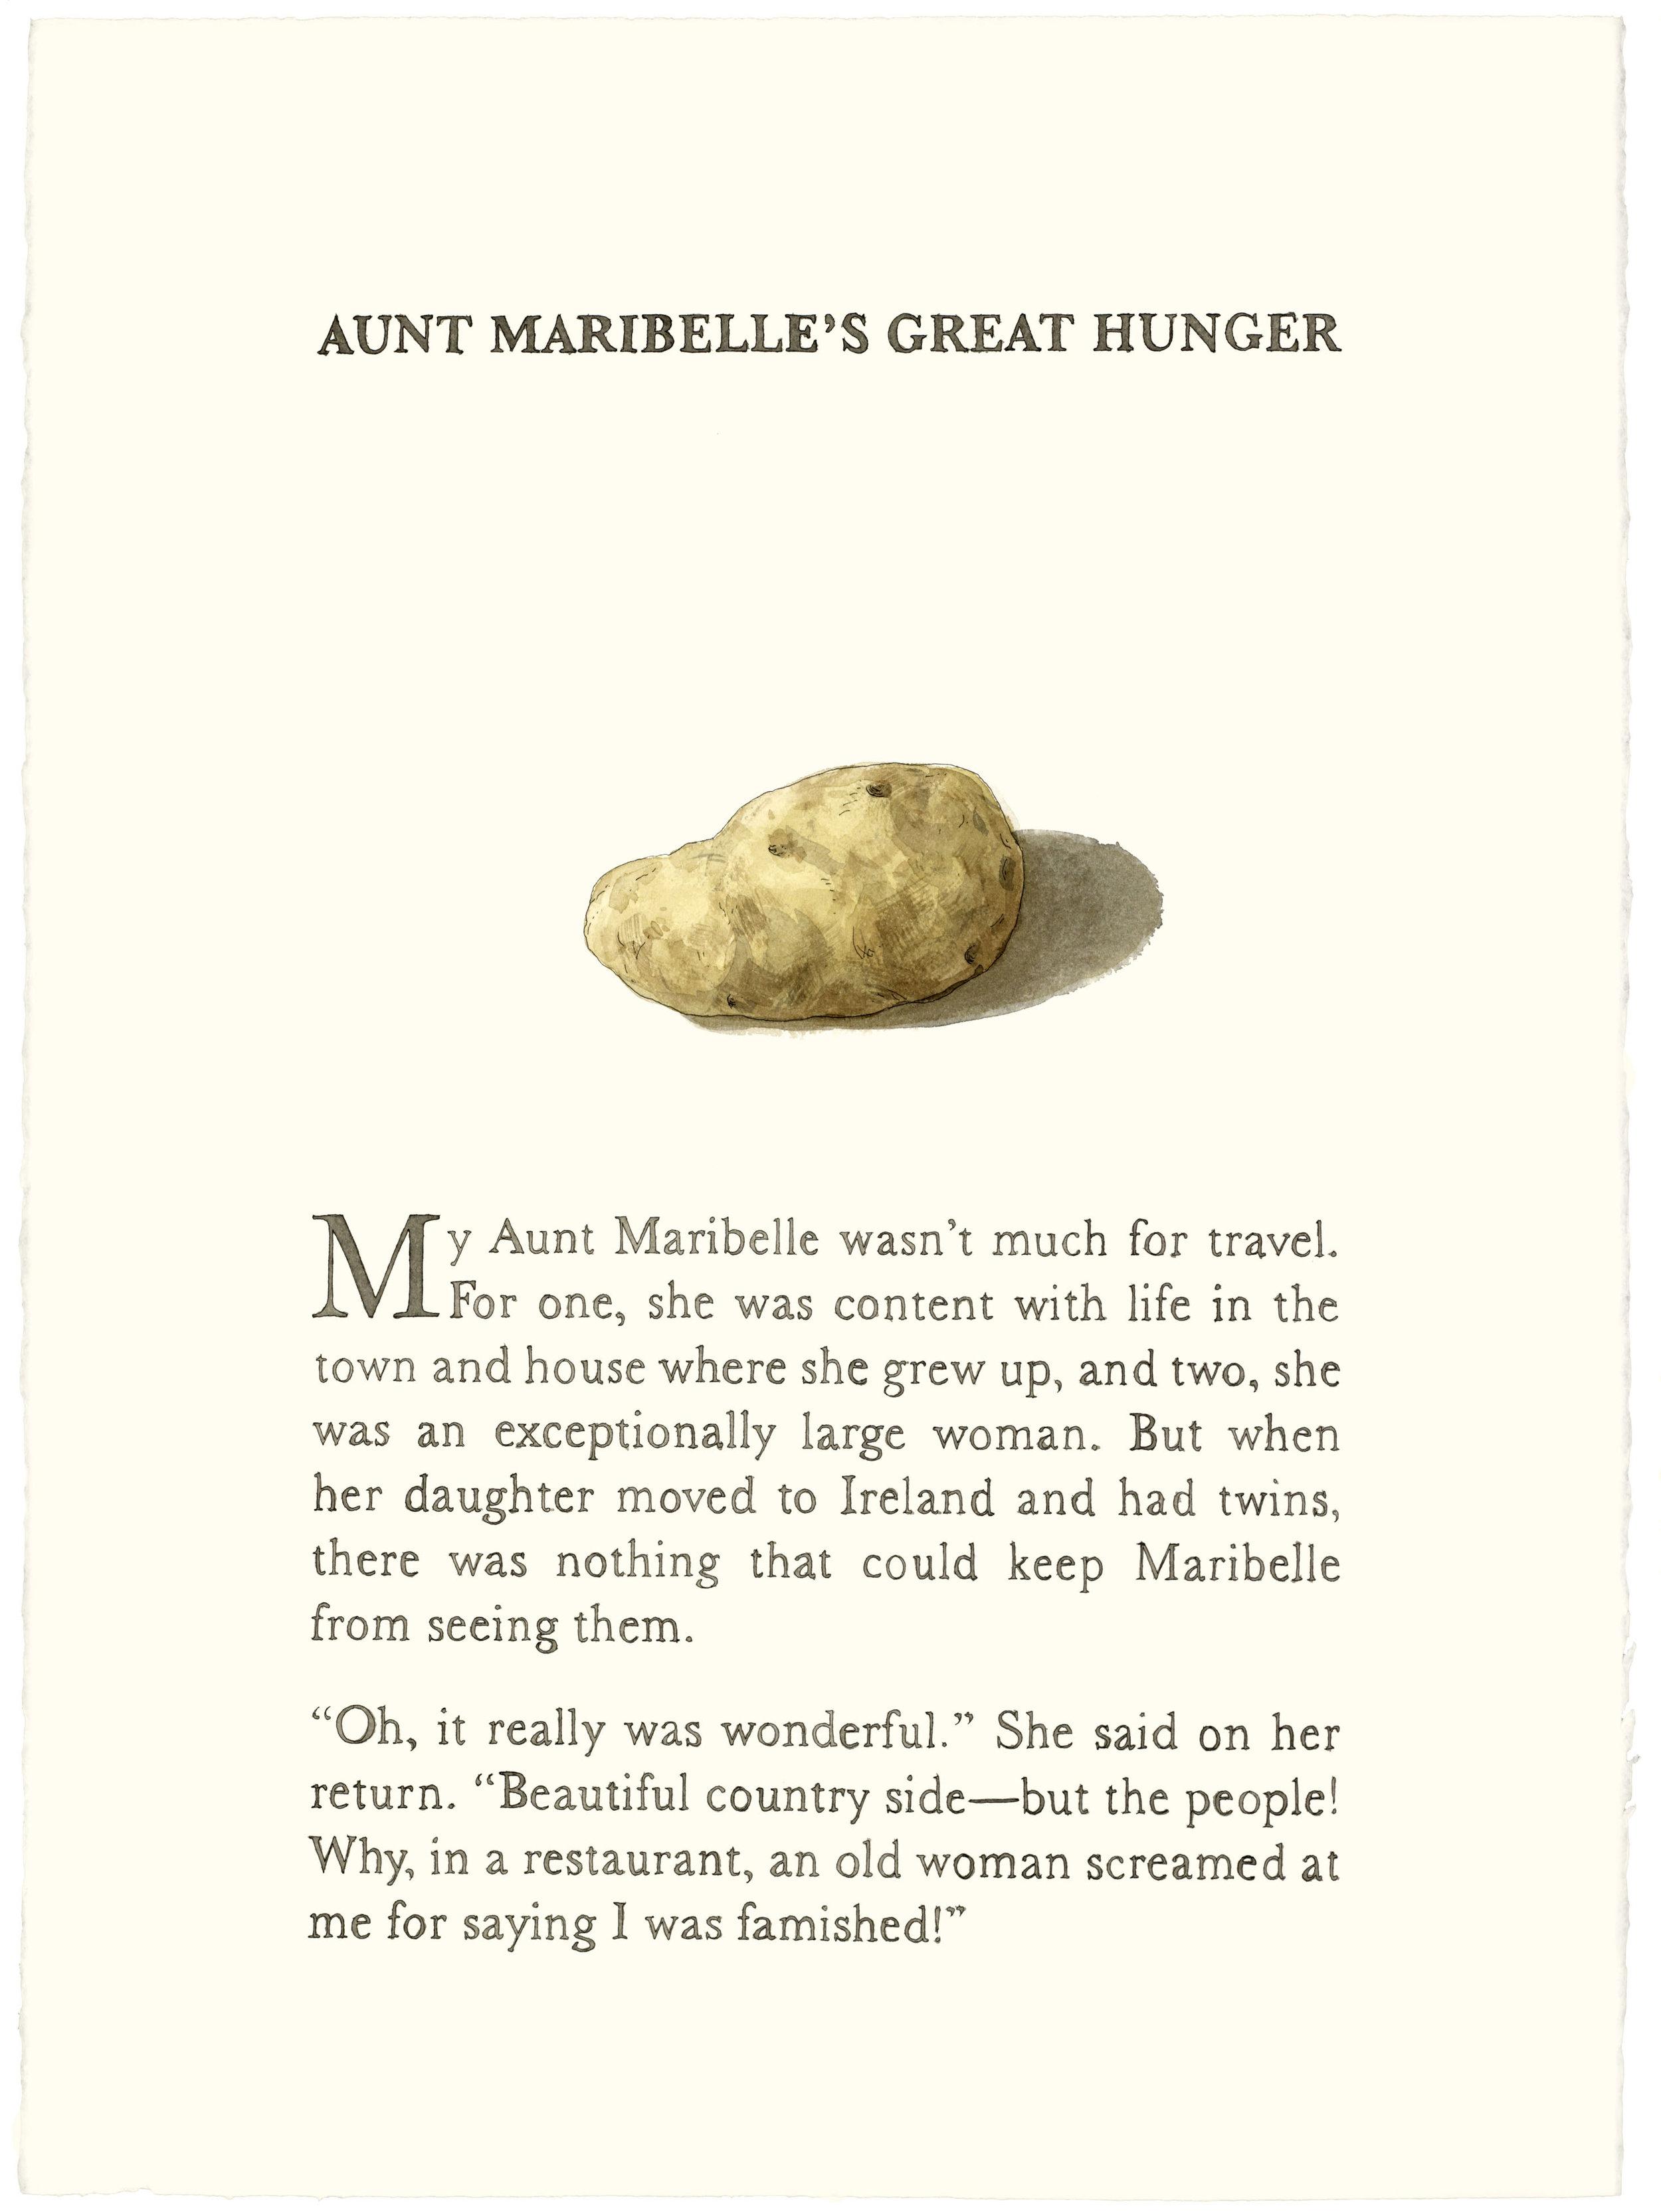 Aunt Maribelle's Great Hunger